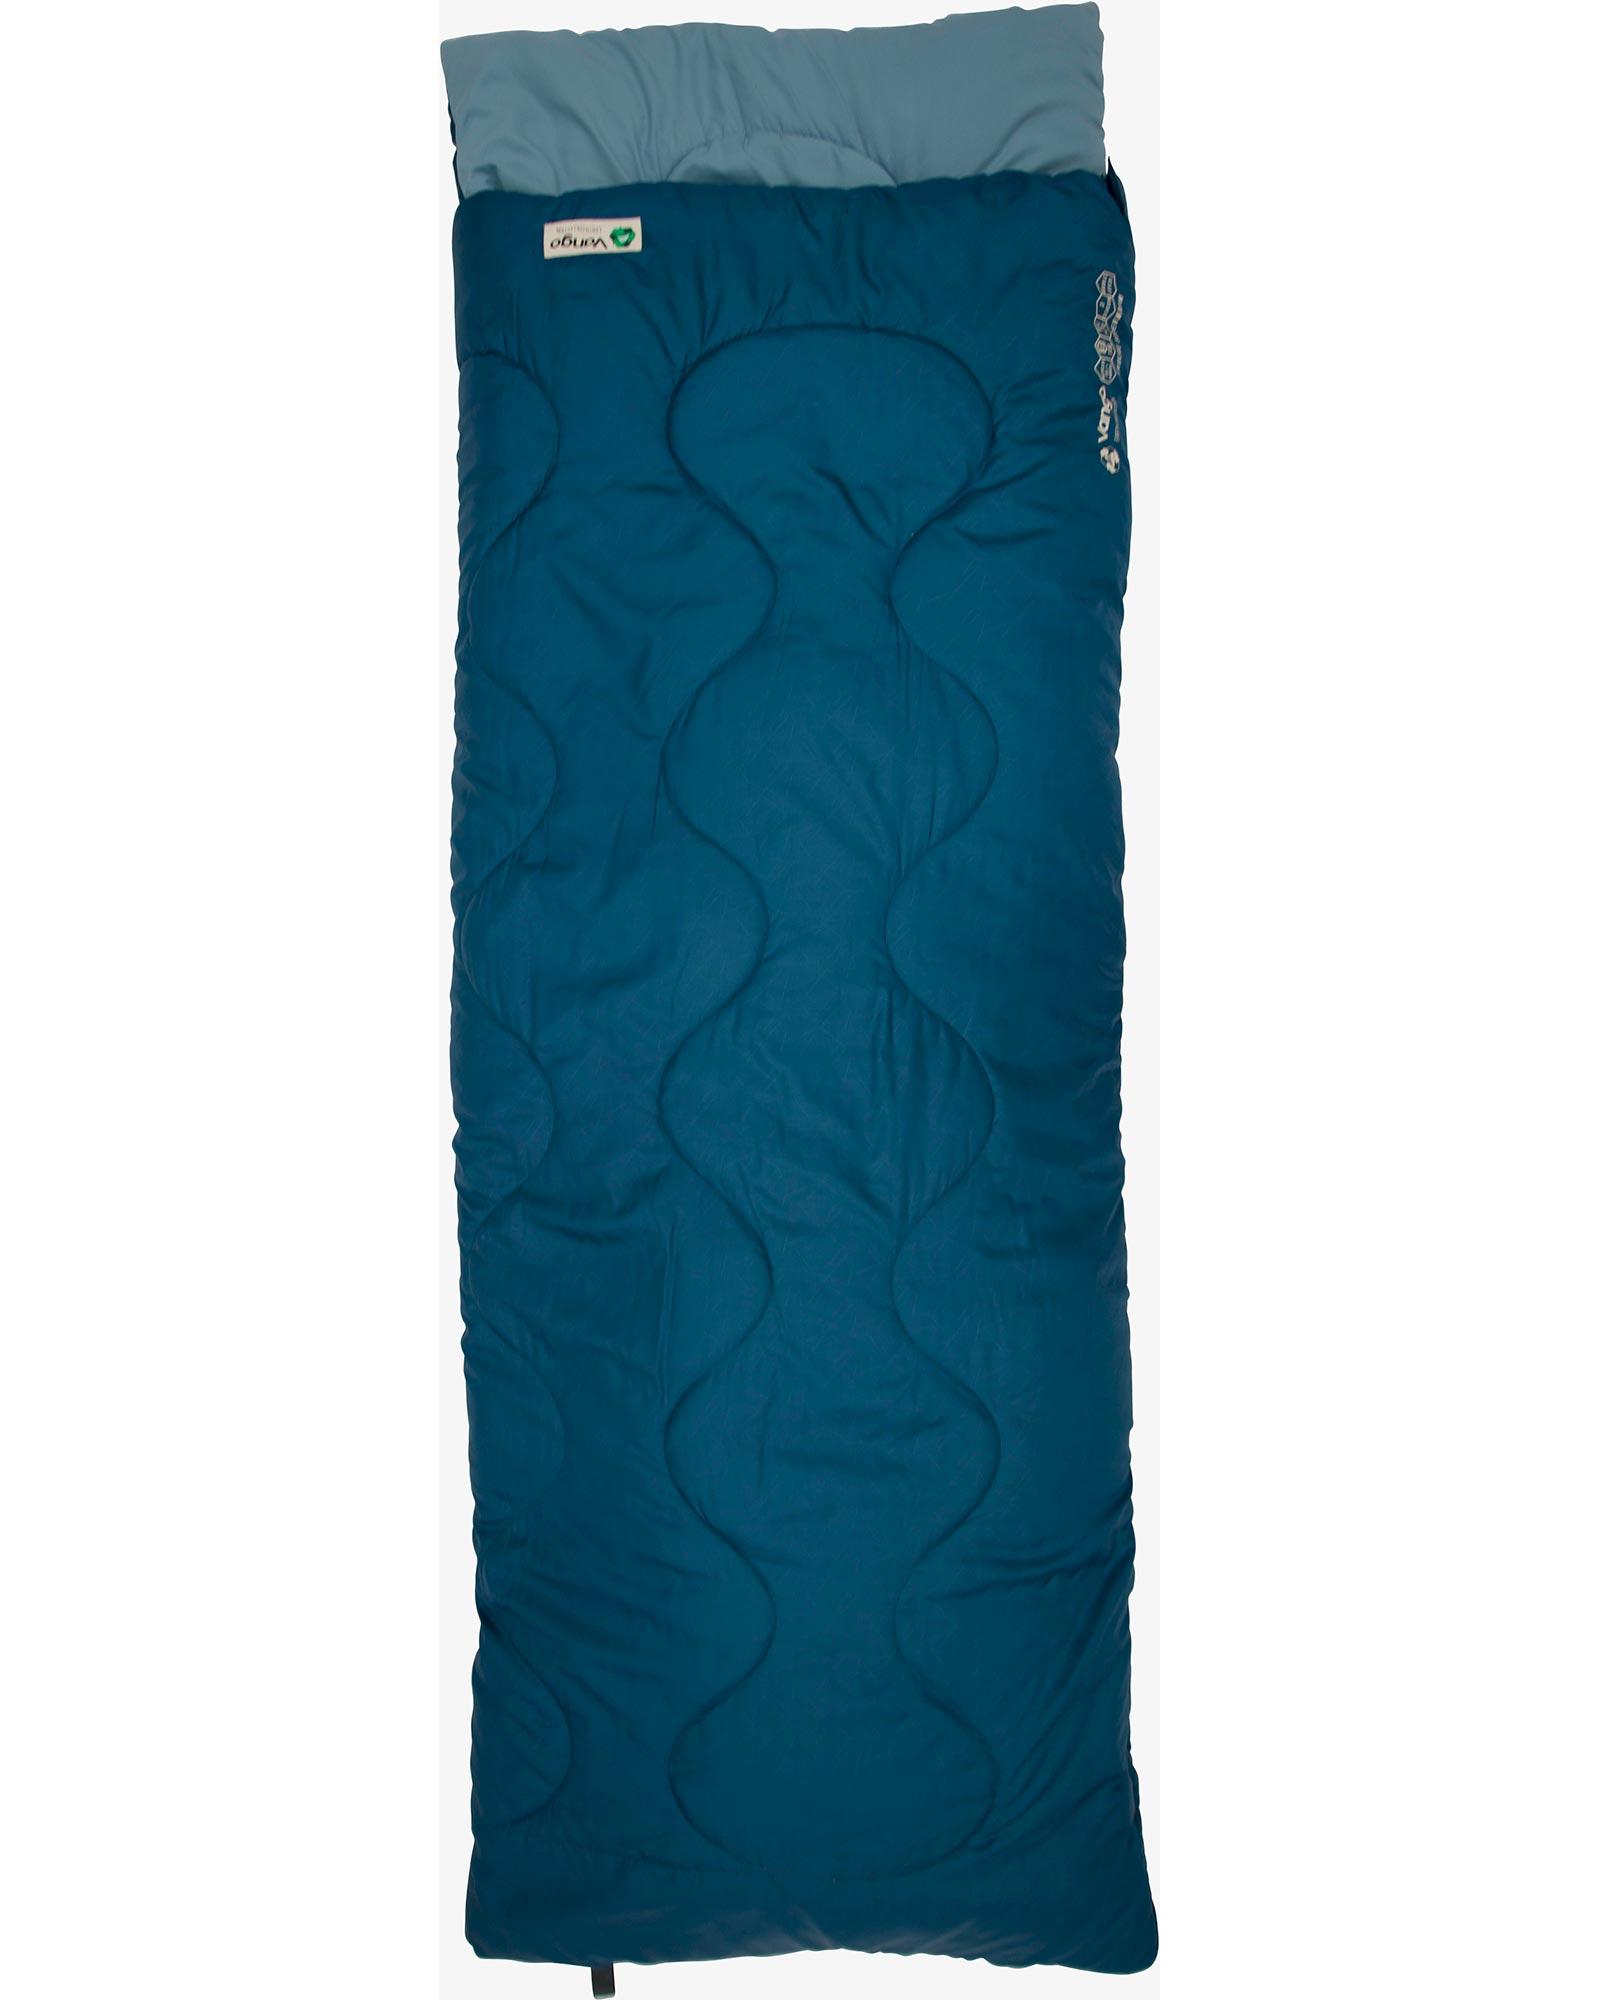 Vango Evolve Superwarm Single Sleeping Bag 0